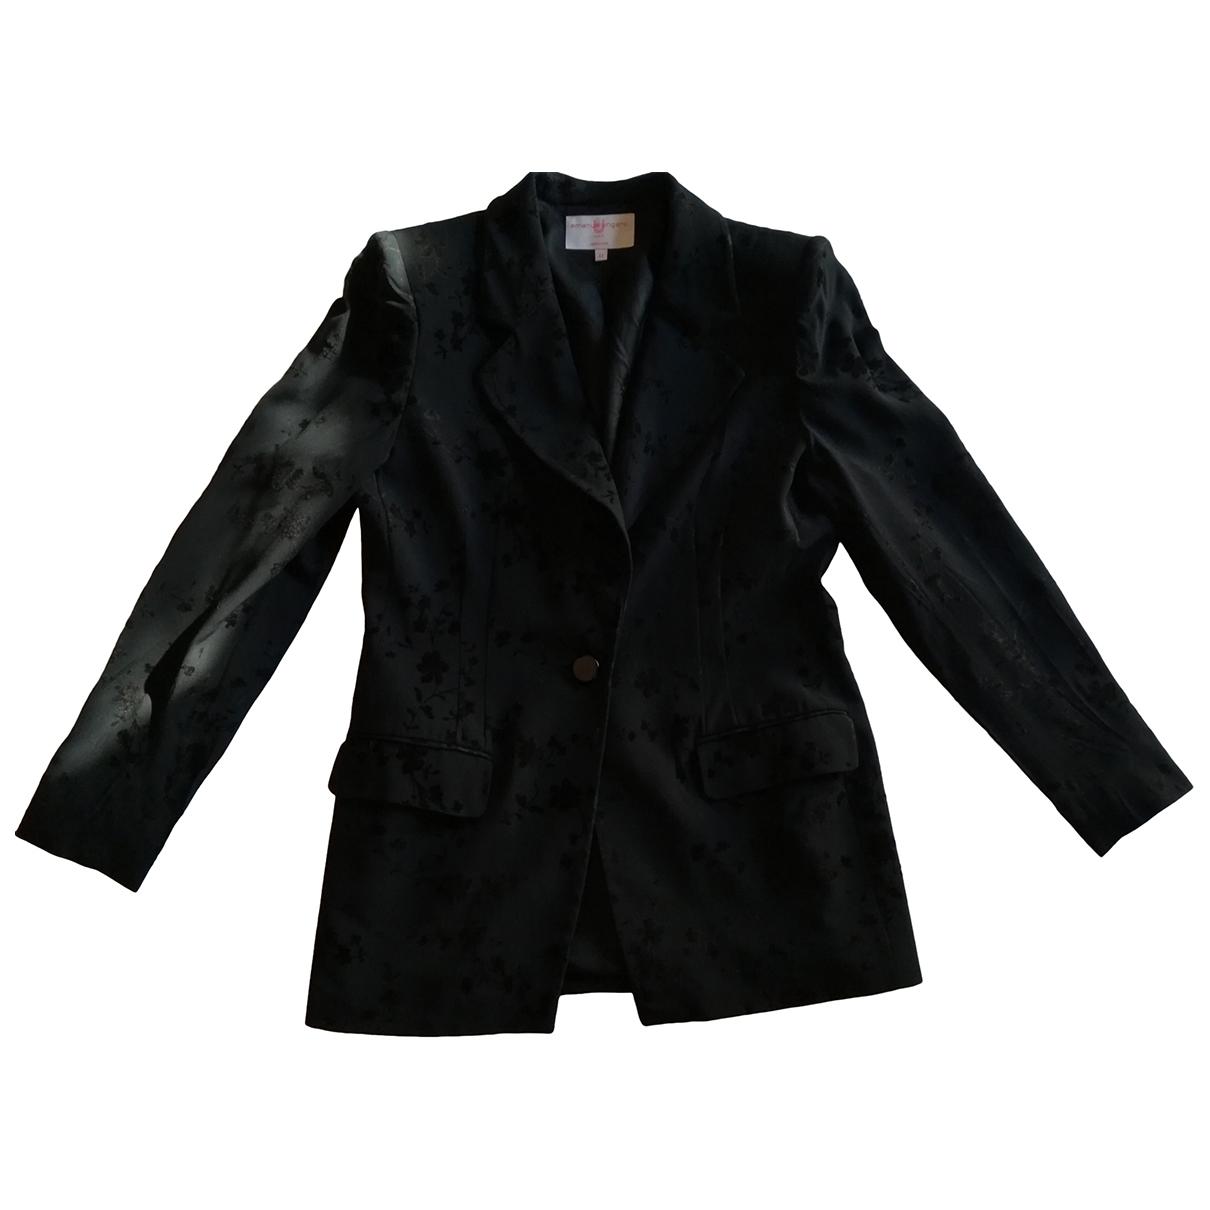 Emanuel Ungaro \N Black jacket for Women 44 IT